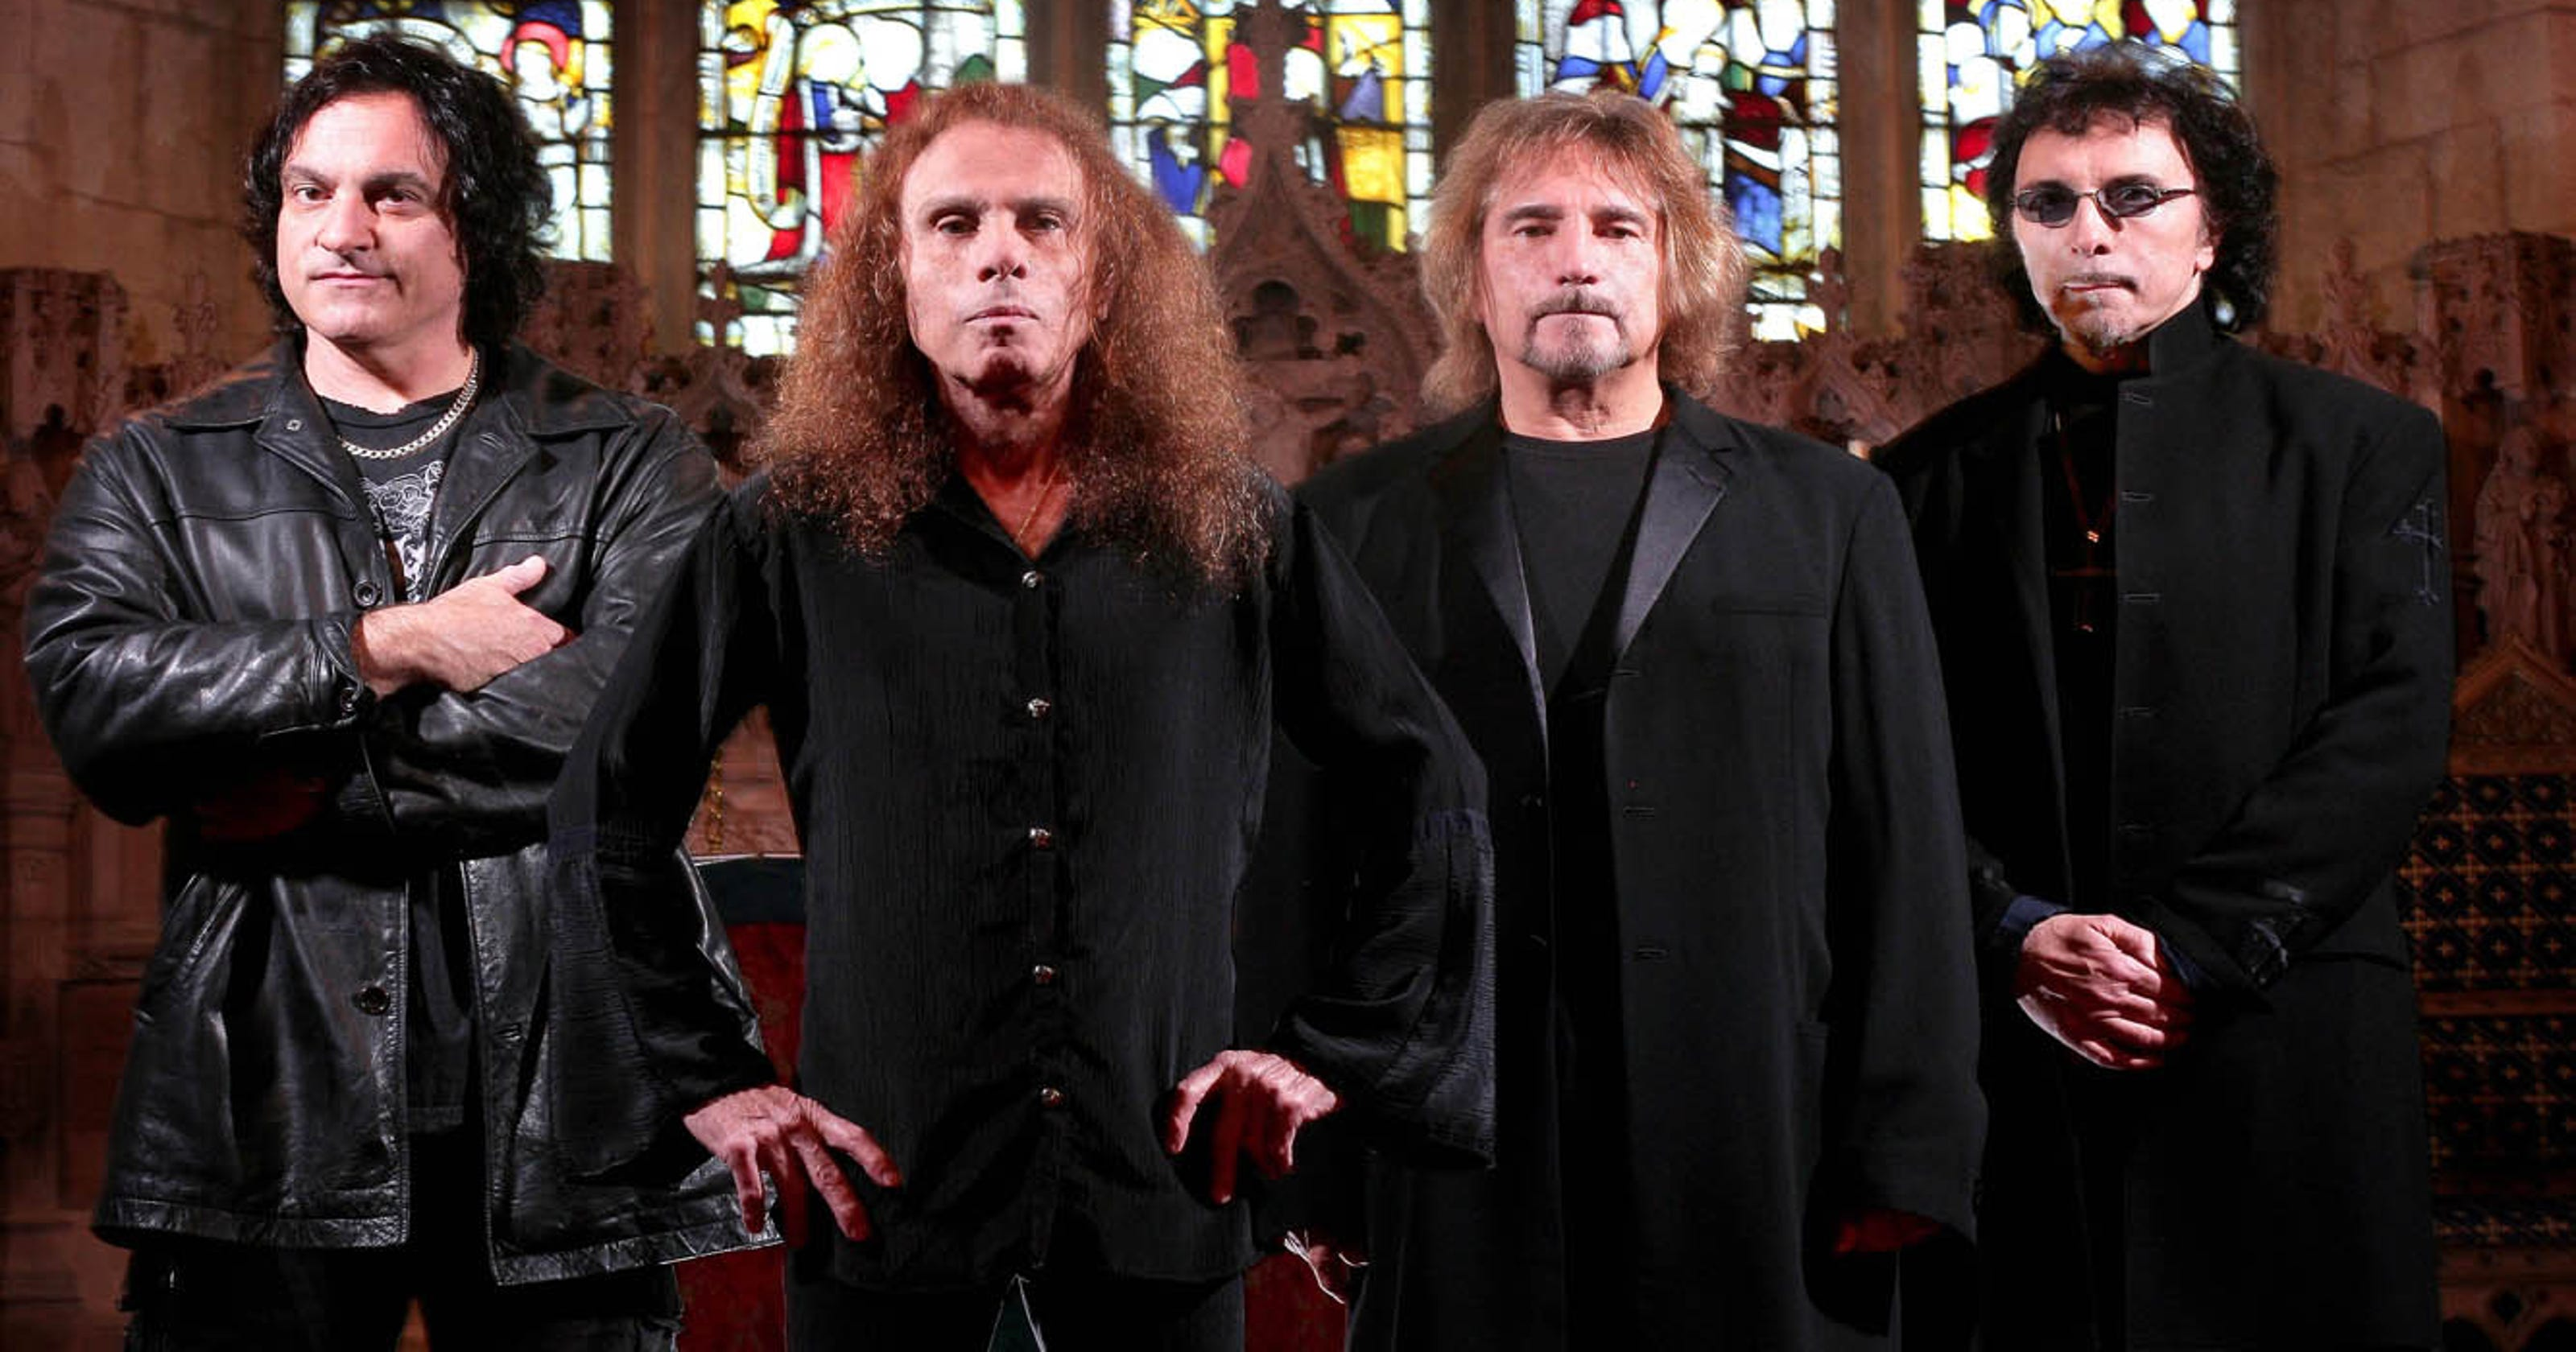 Black Sabbath Drummer Will Visit Cape Coral This Wednesday